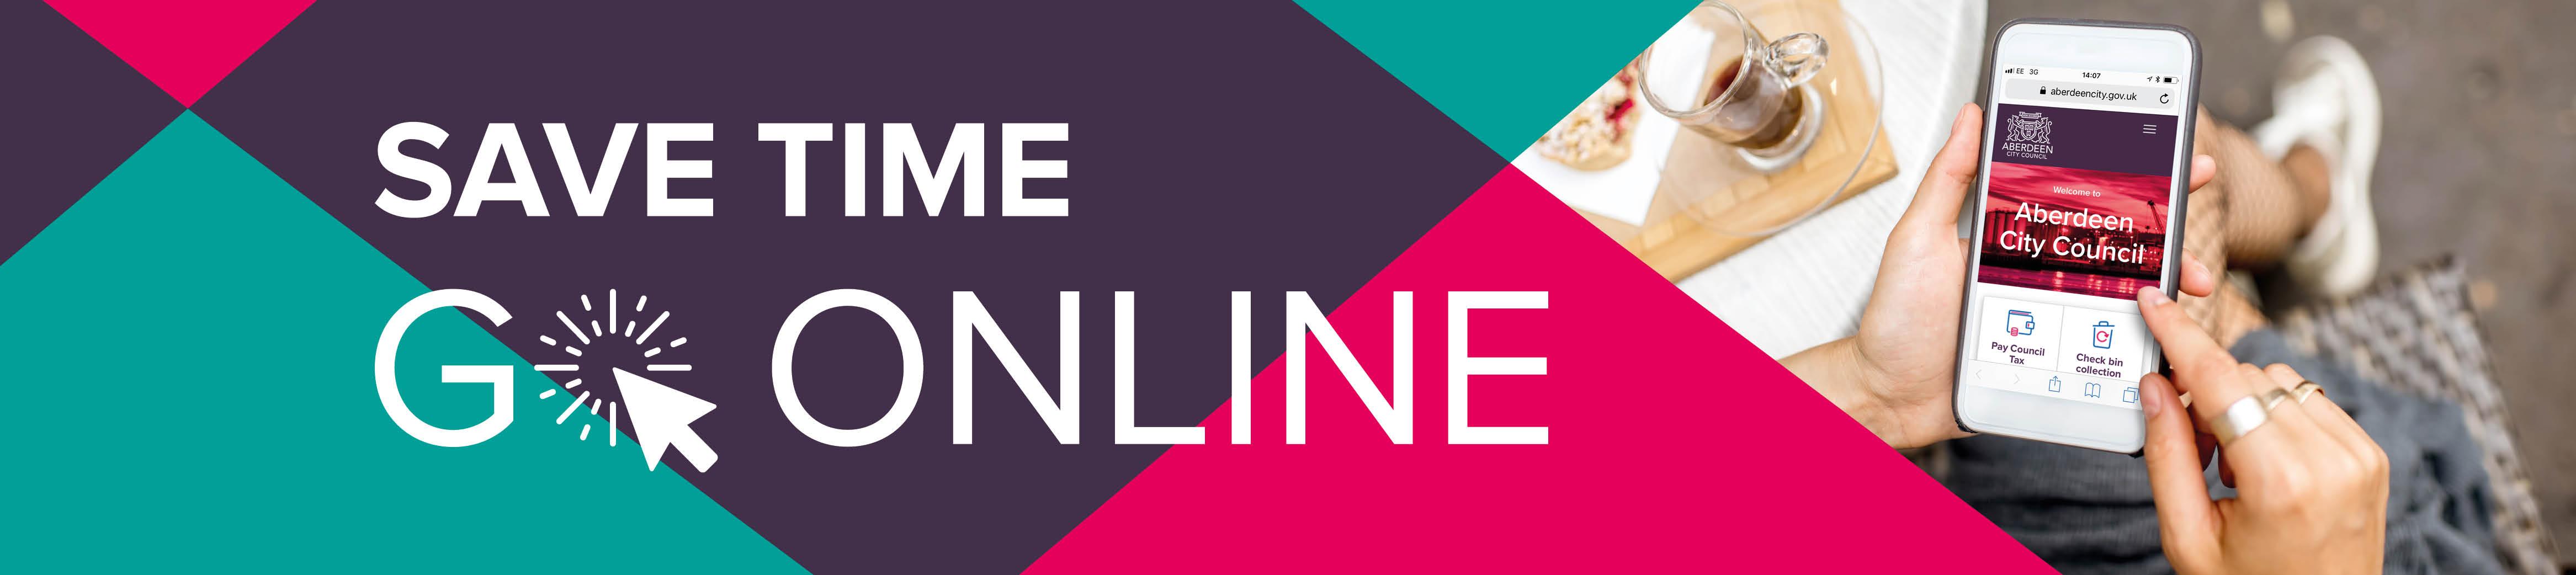 Online services | Aberdeen City Council